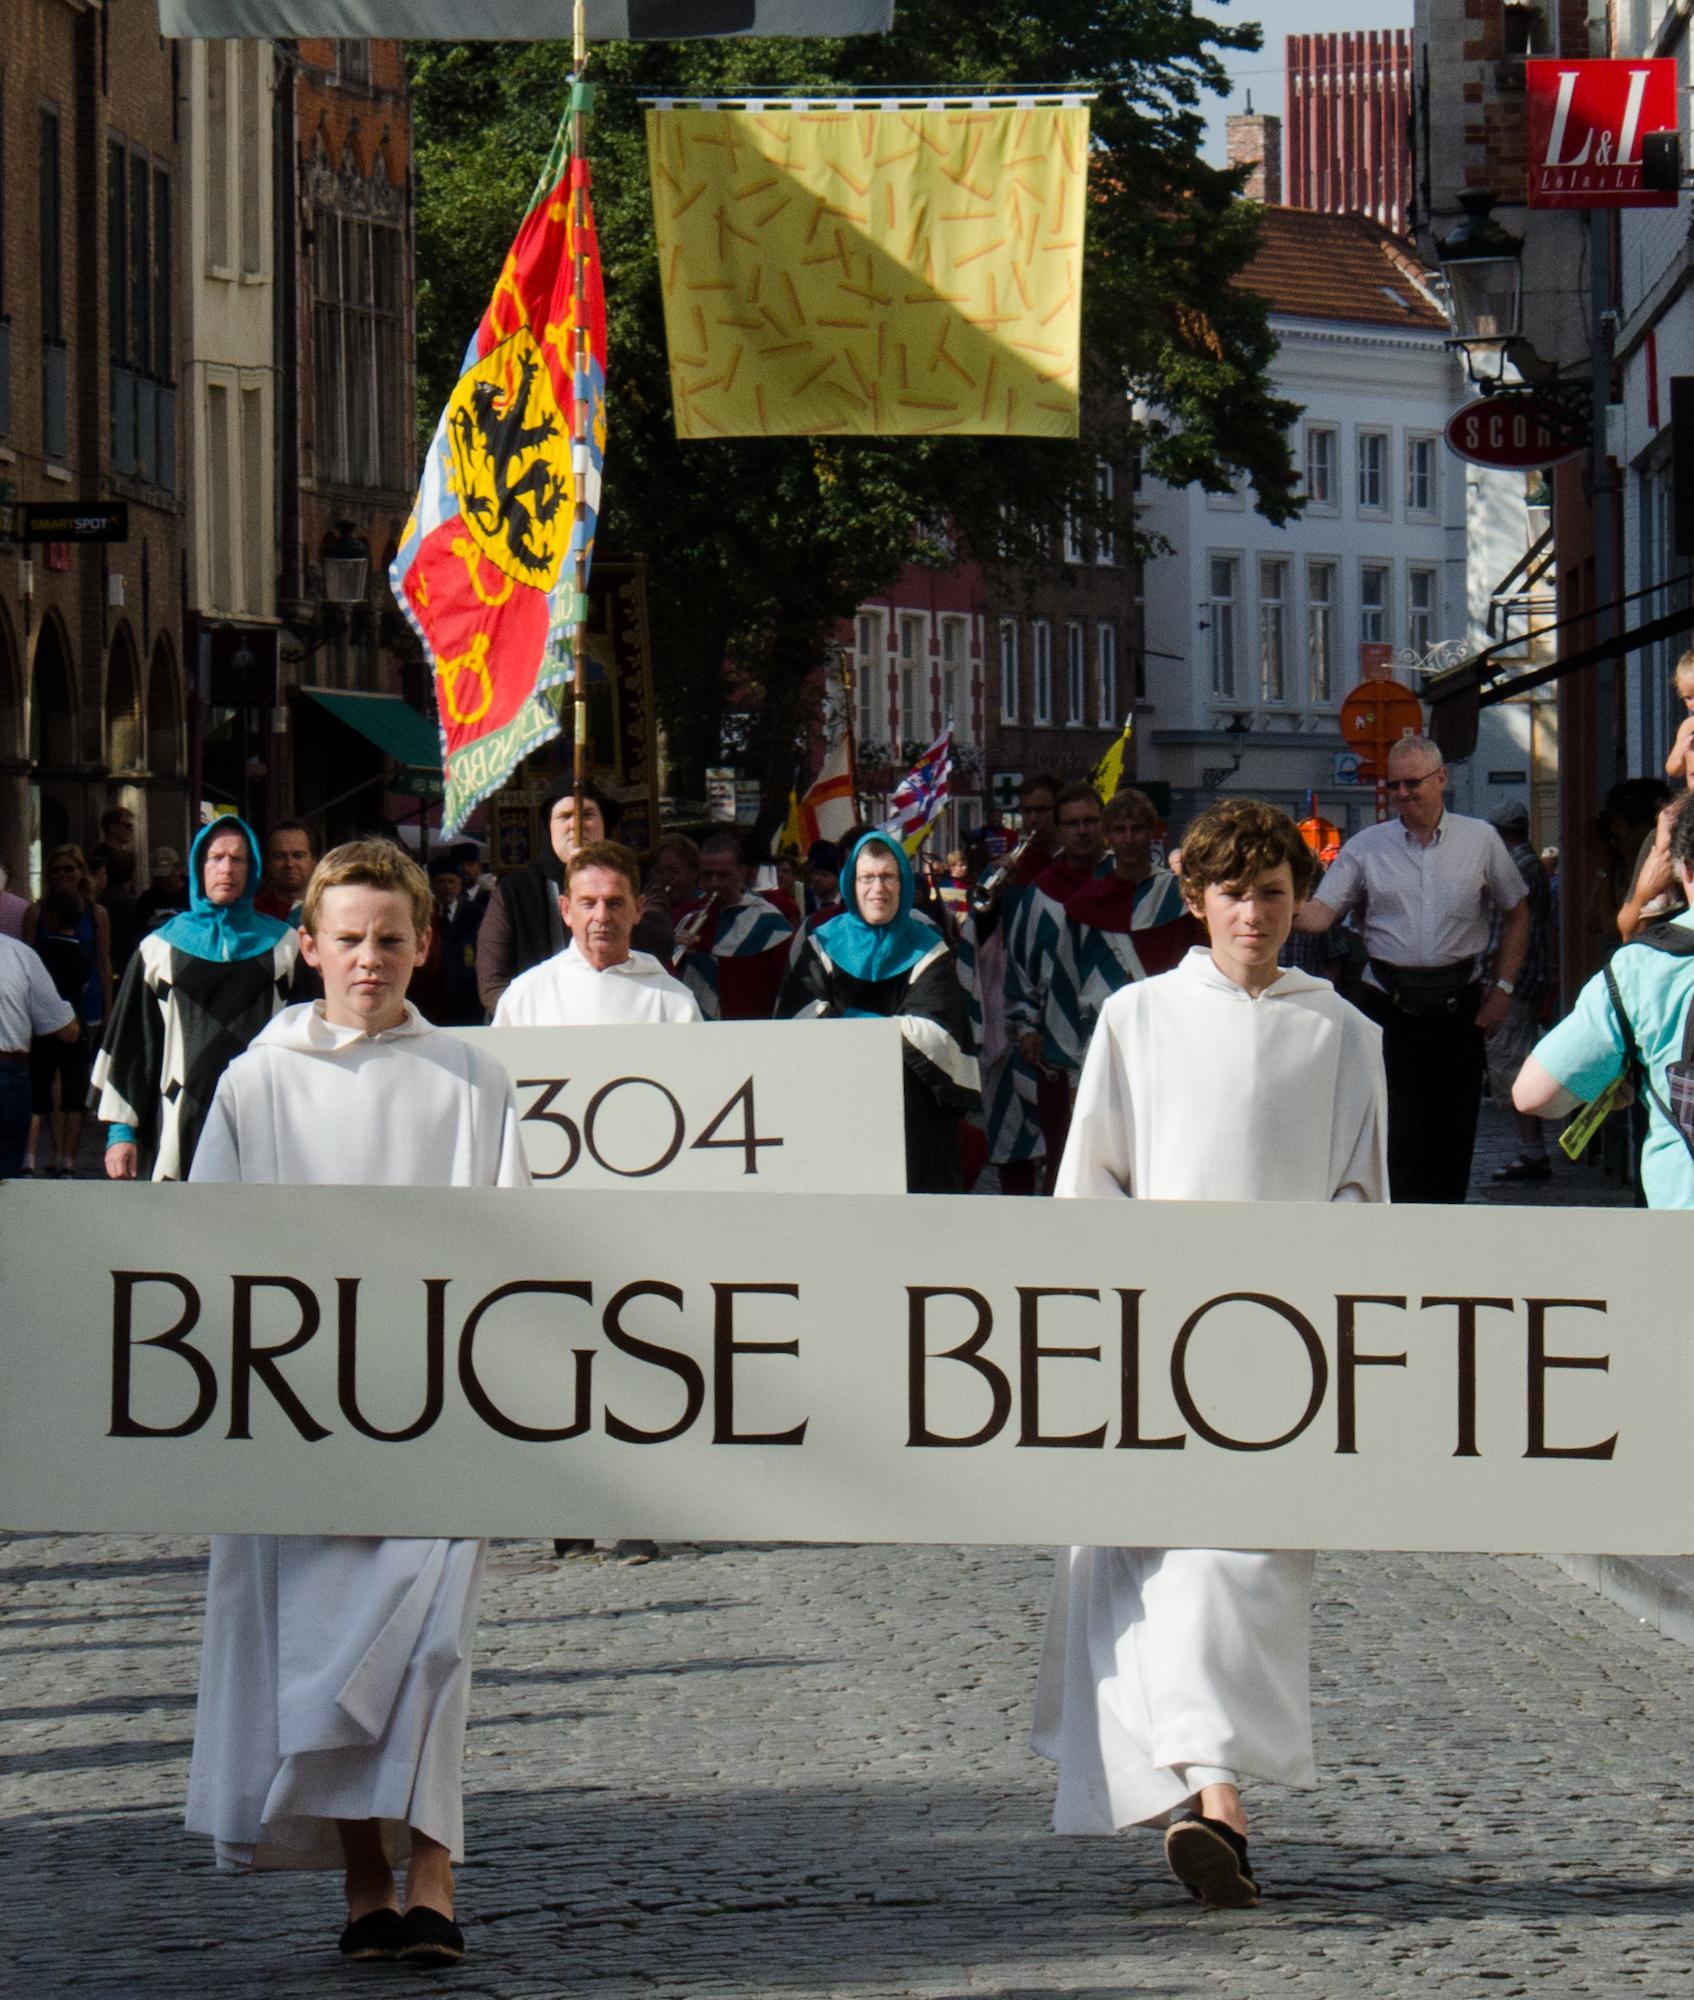 2012-08-15 103 Brugge